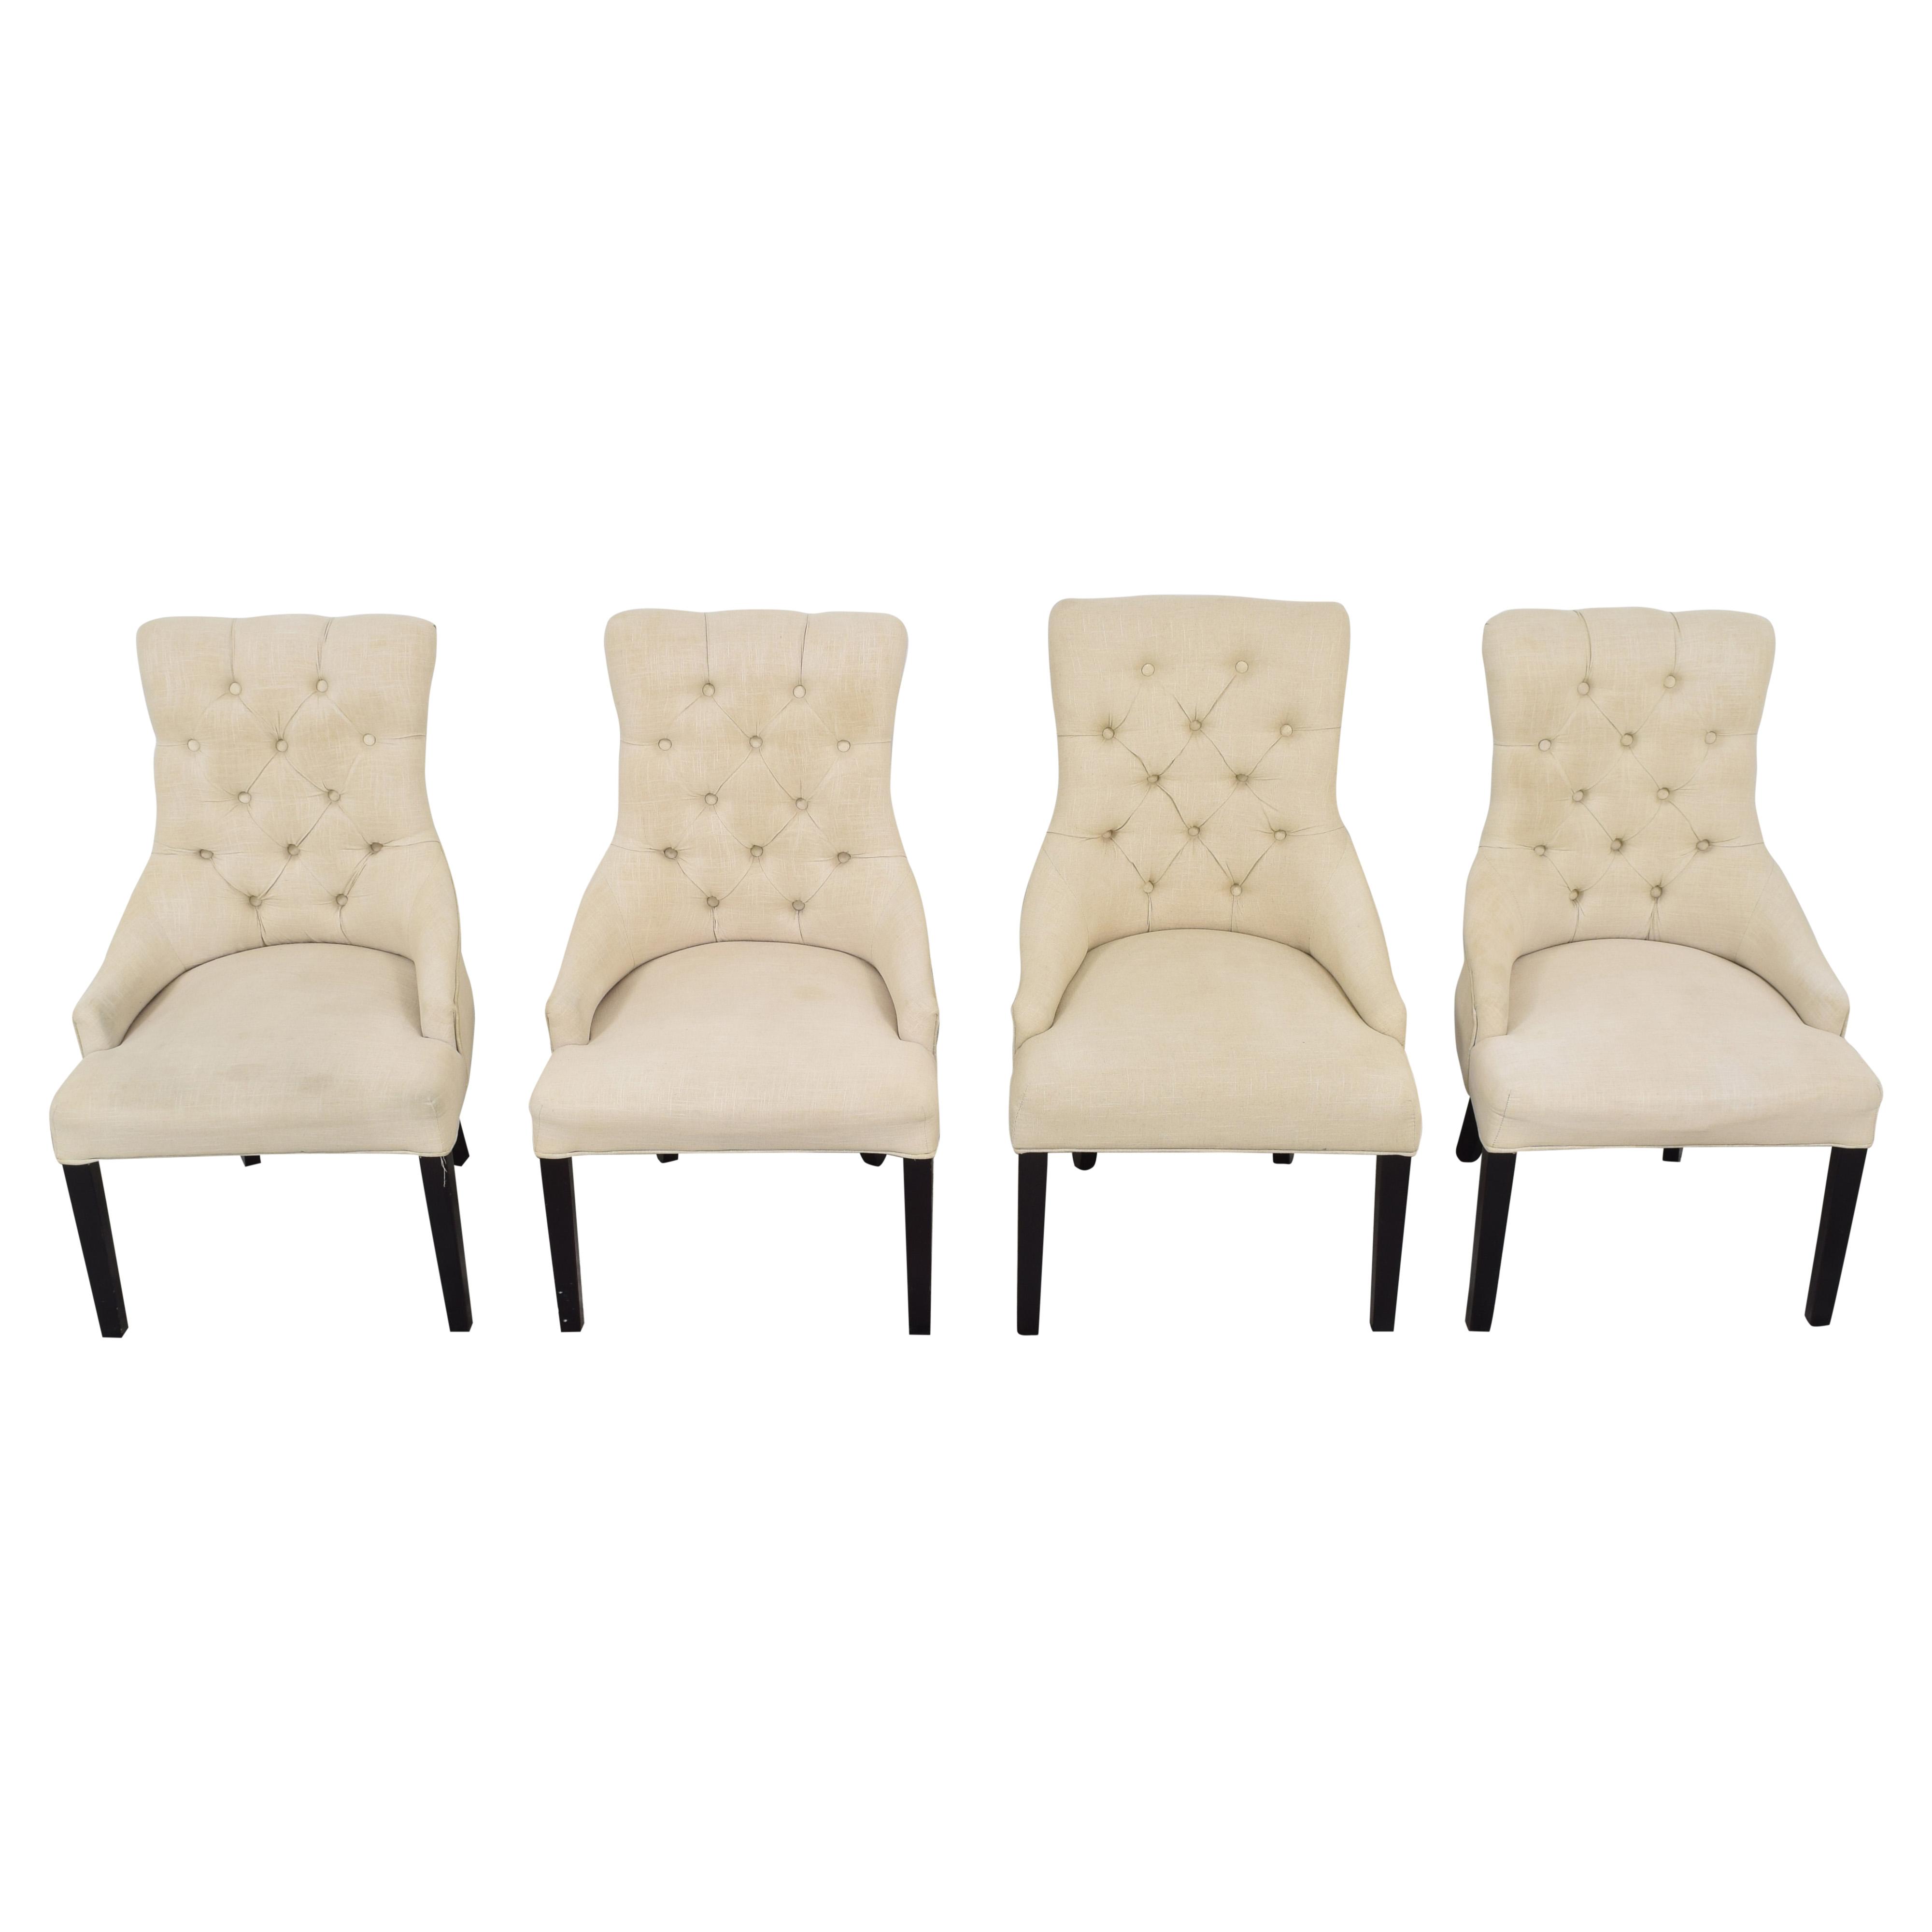 Macy's Macy's Marais Dining Parsons Chairs nj